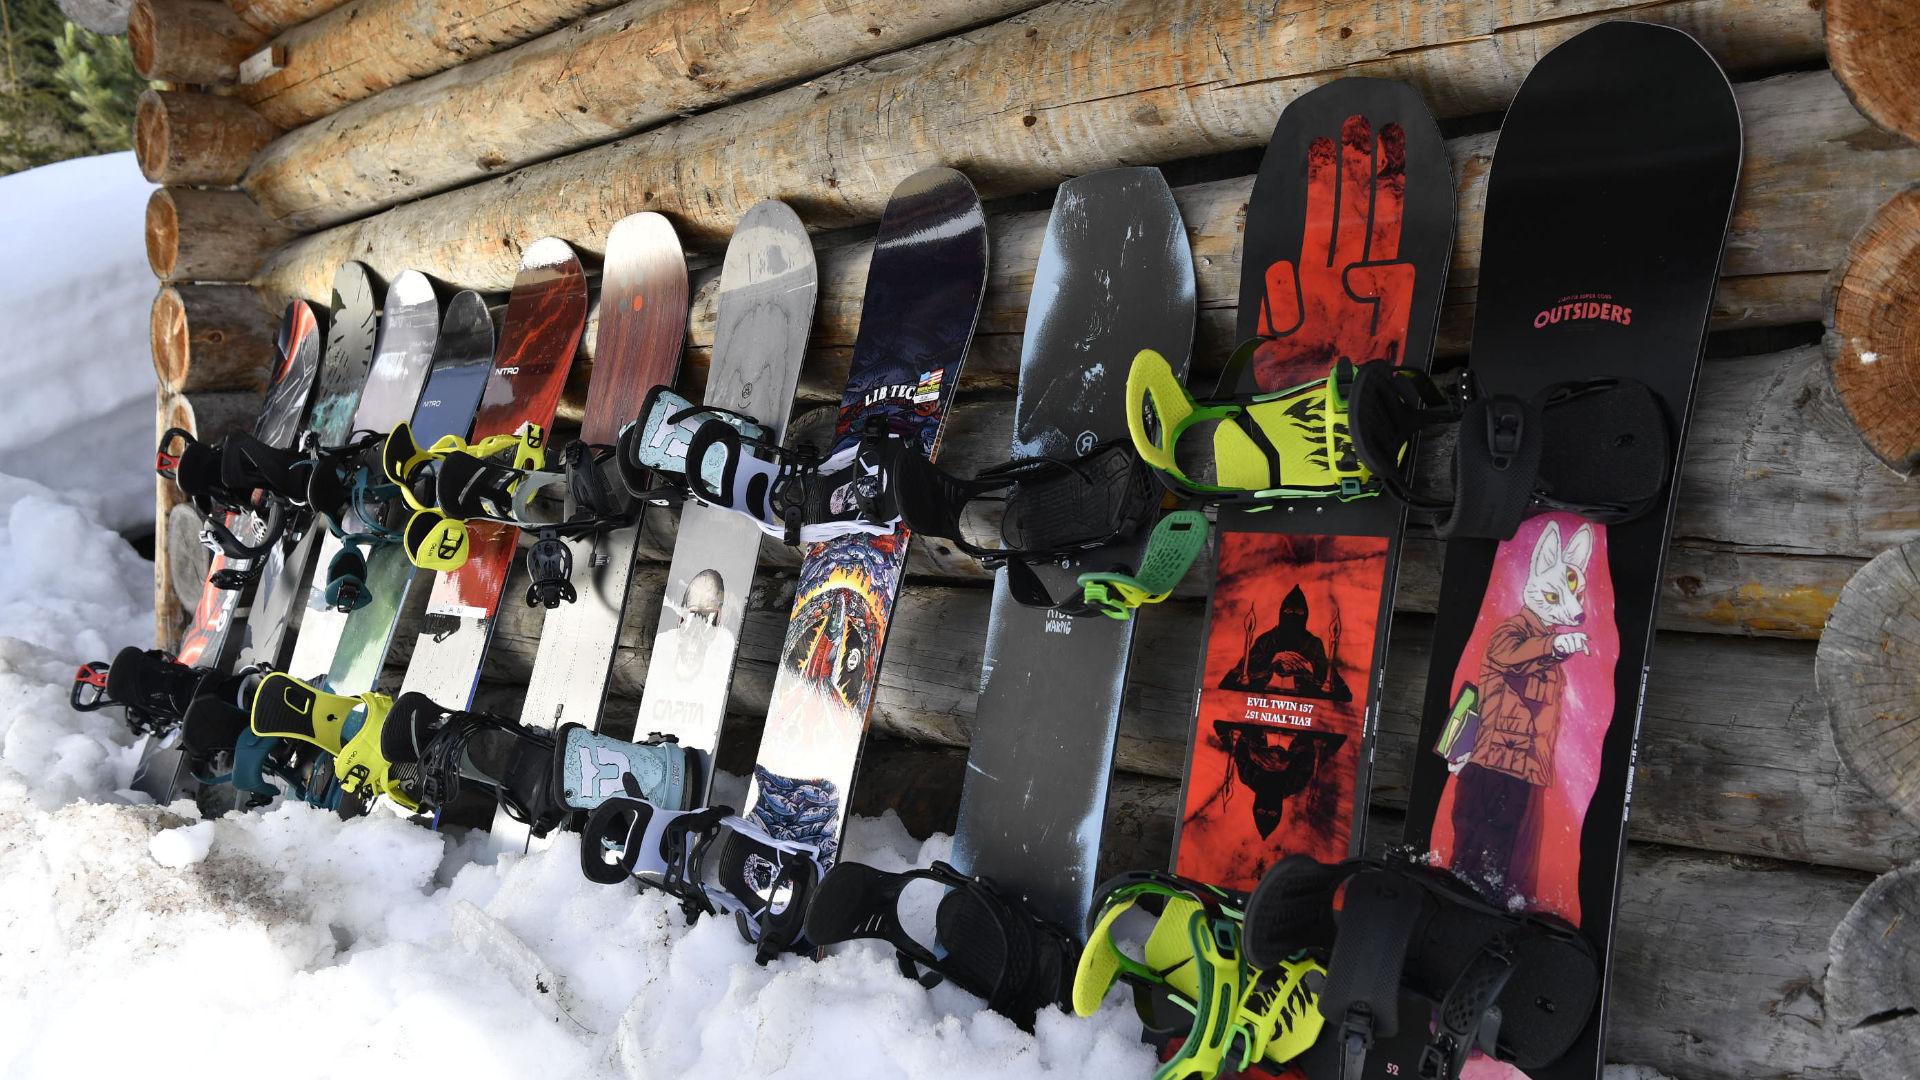 Snowboards of different lengths from Capita, Bataleon, Ride, Lib Tech, Burton, Nitro and GNU